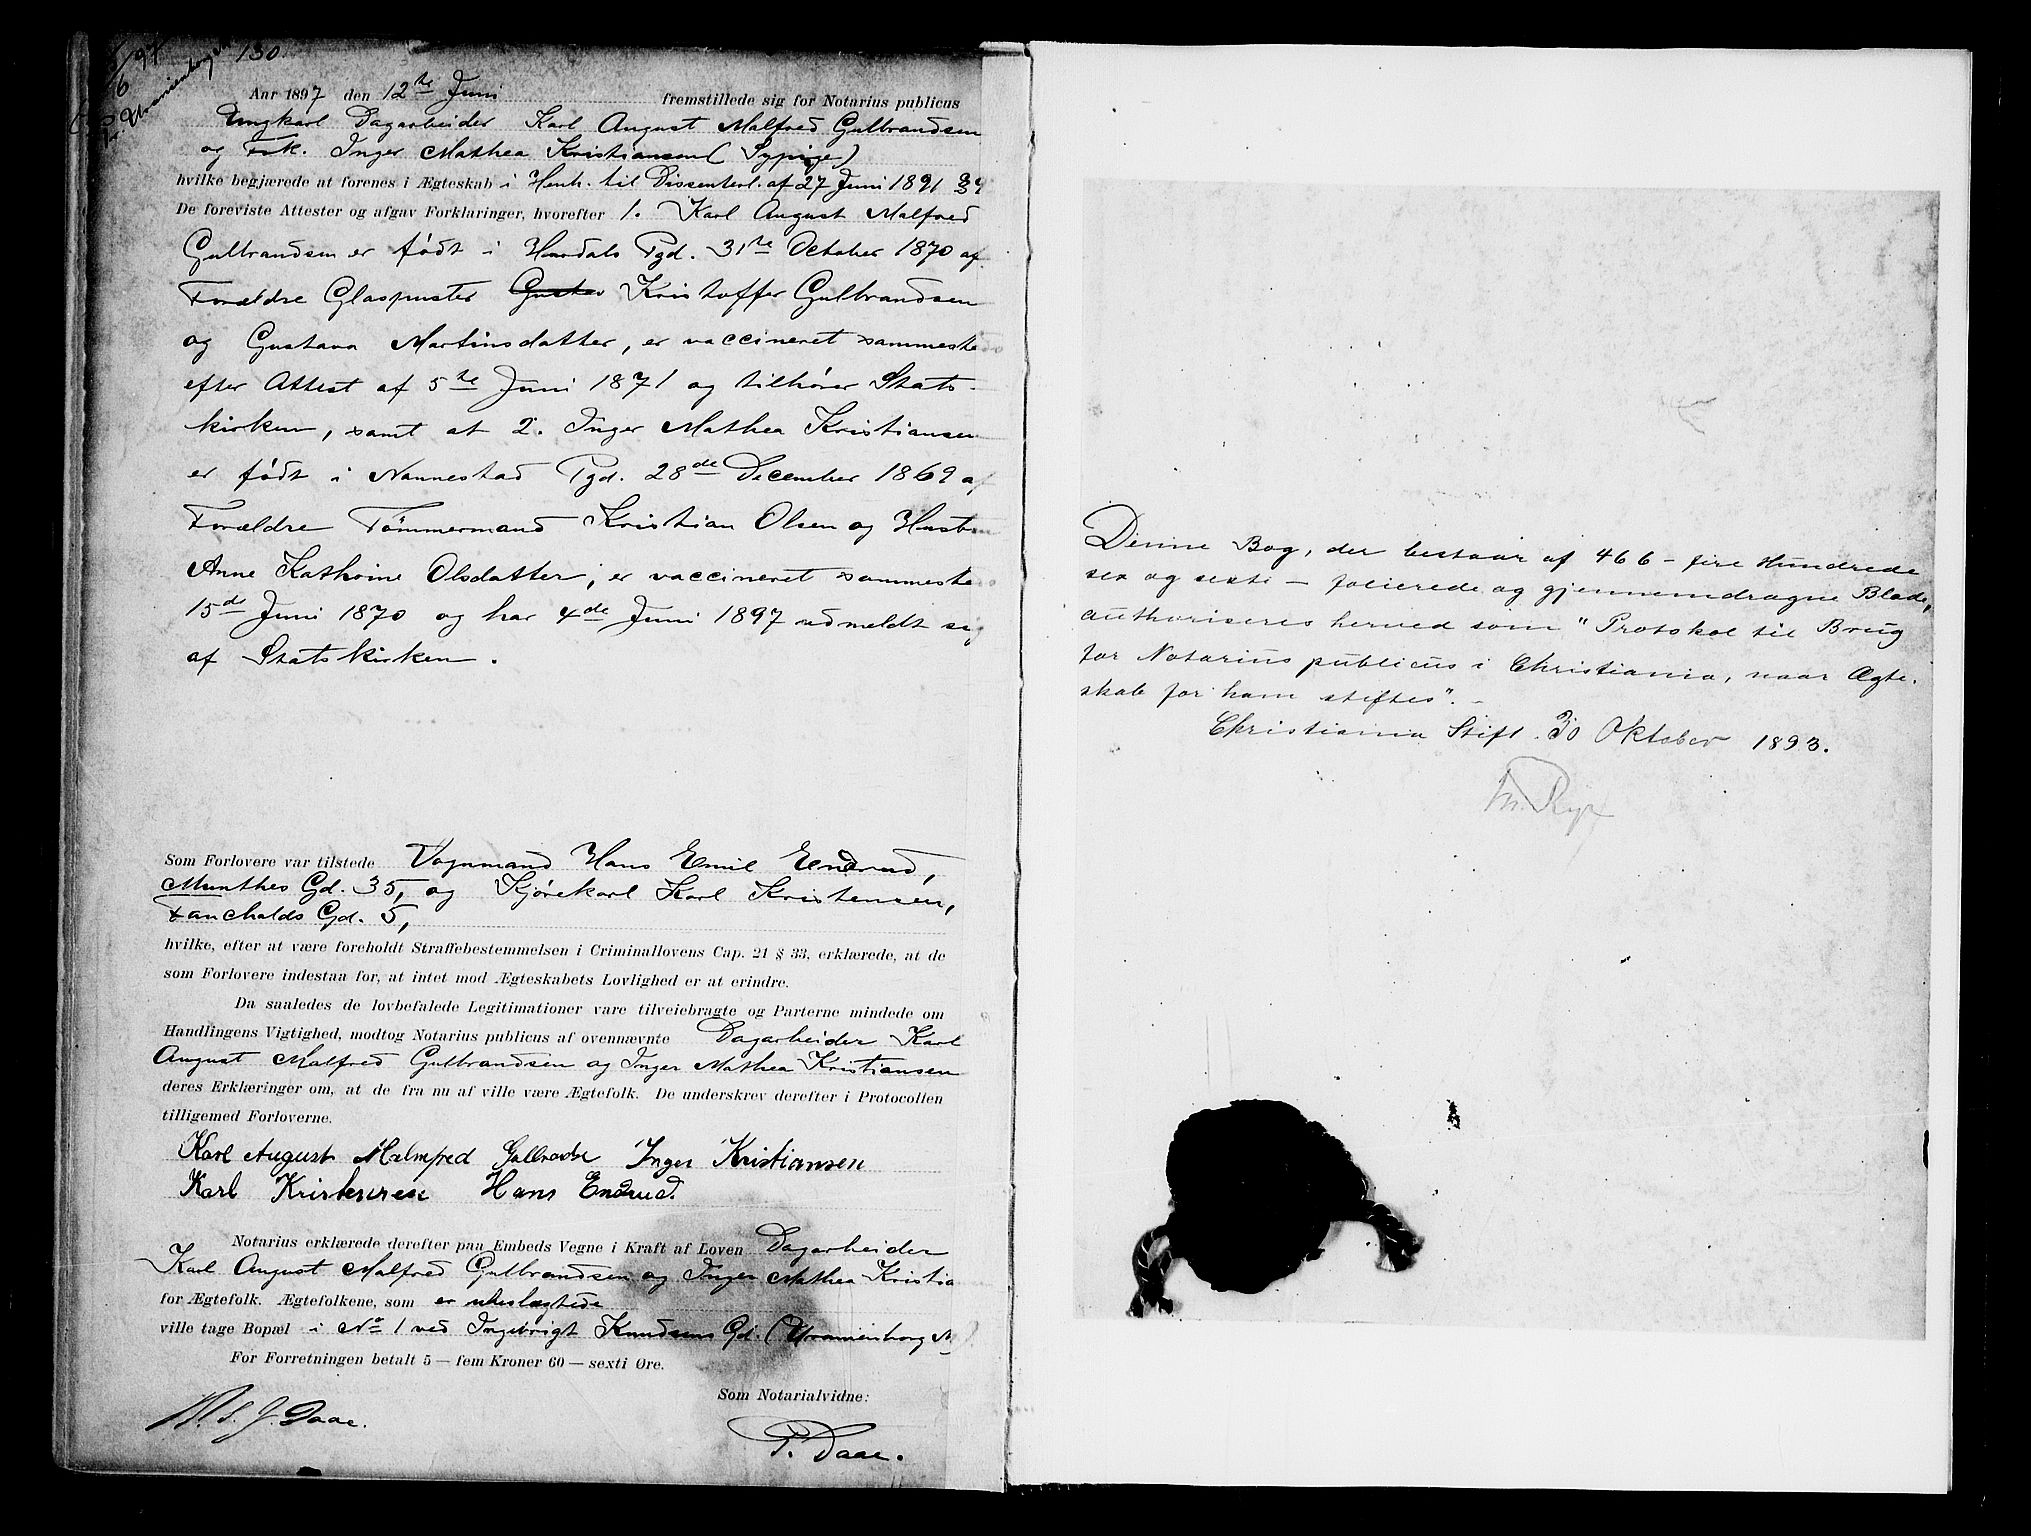 SAO, Oslo byfogd avd. I, L/Lb/Lbb/L0003: Notarialprotokoll, rekke II: Vigsler, 1893-1897, s. 466b-467a